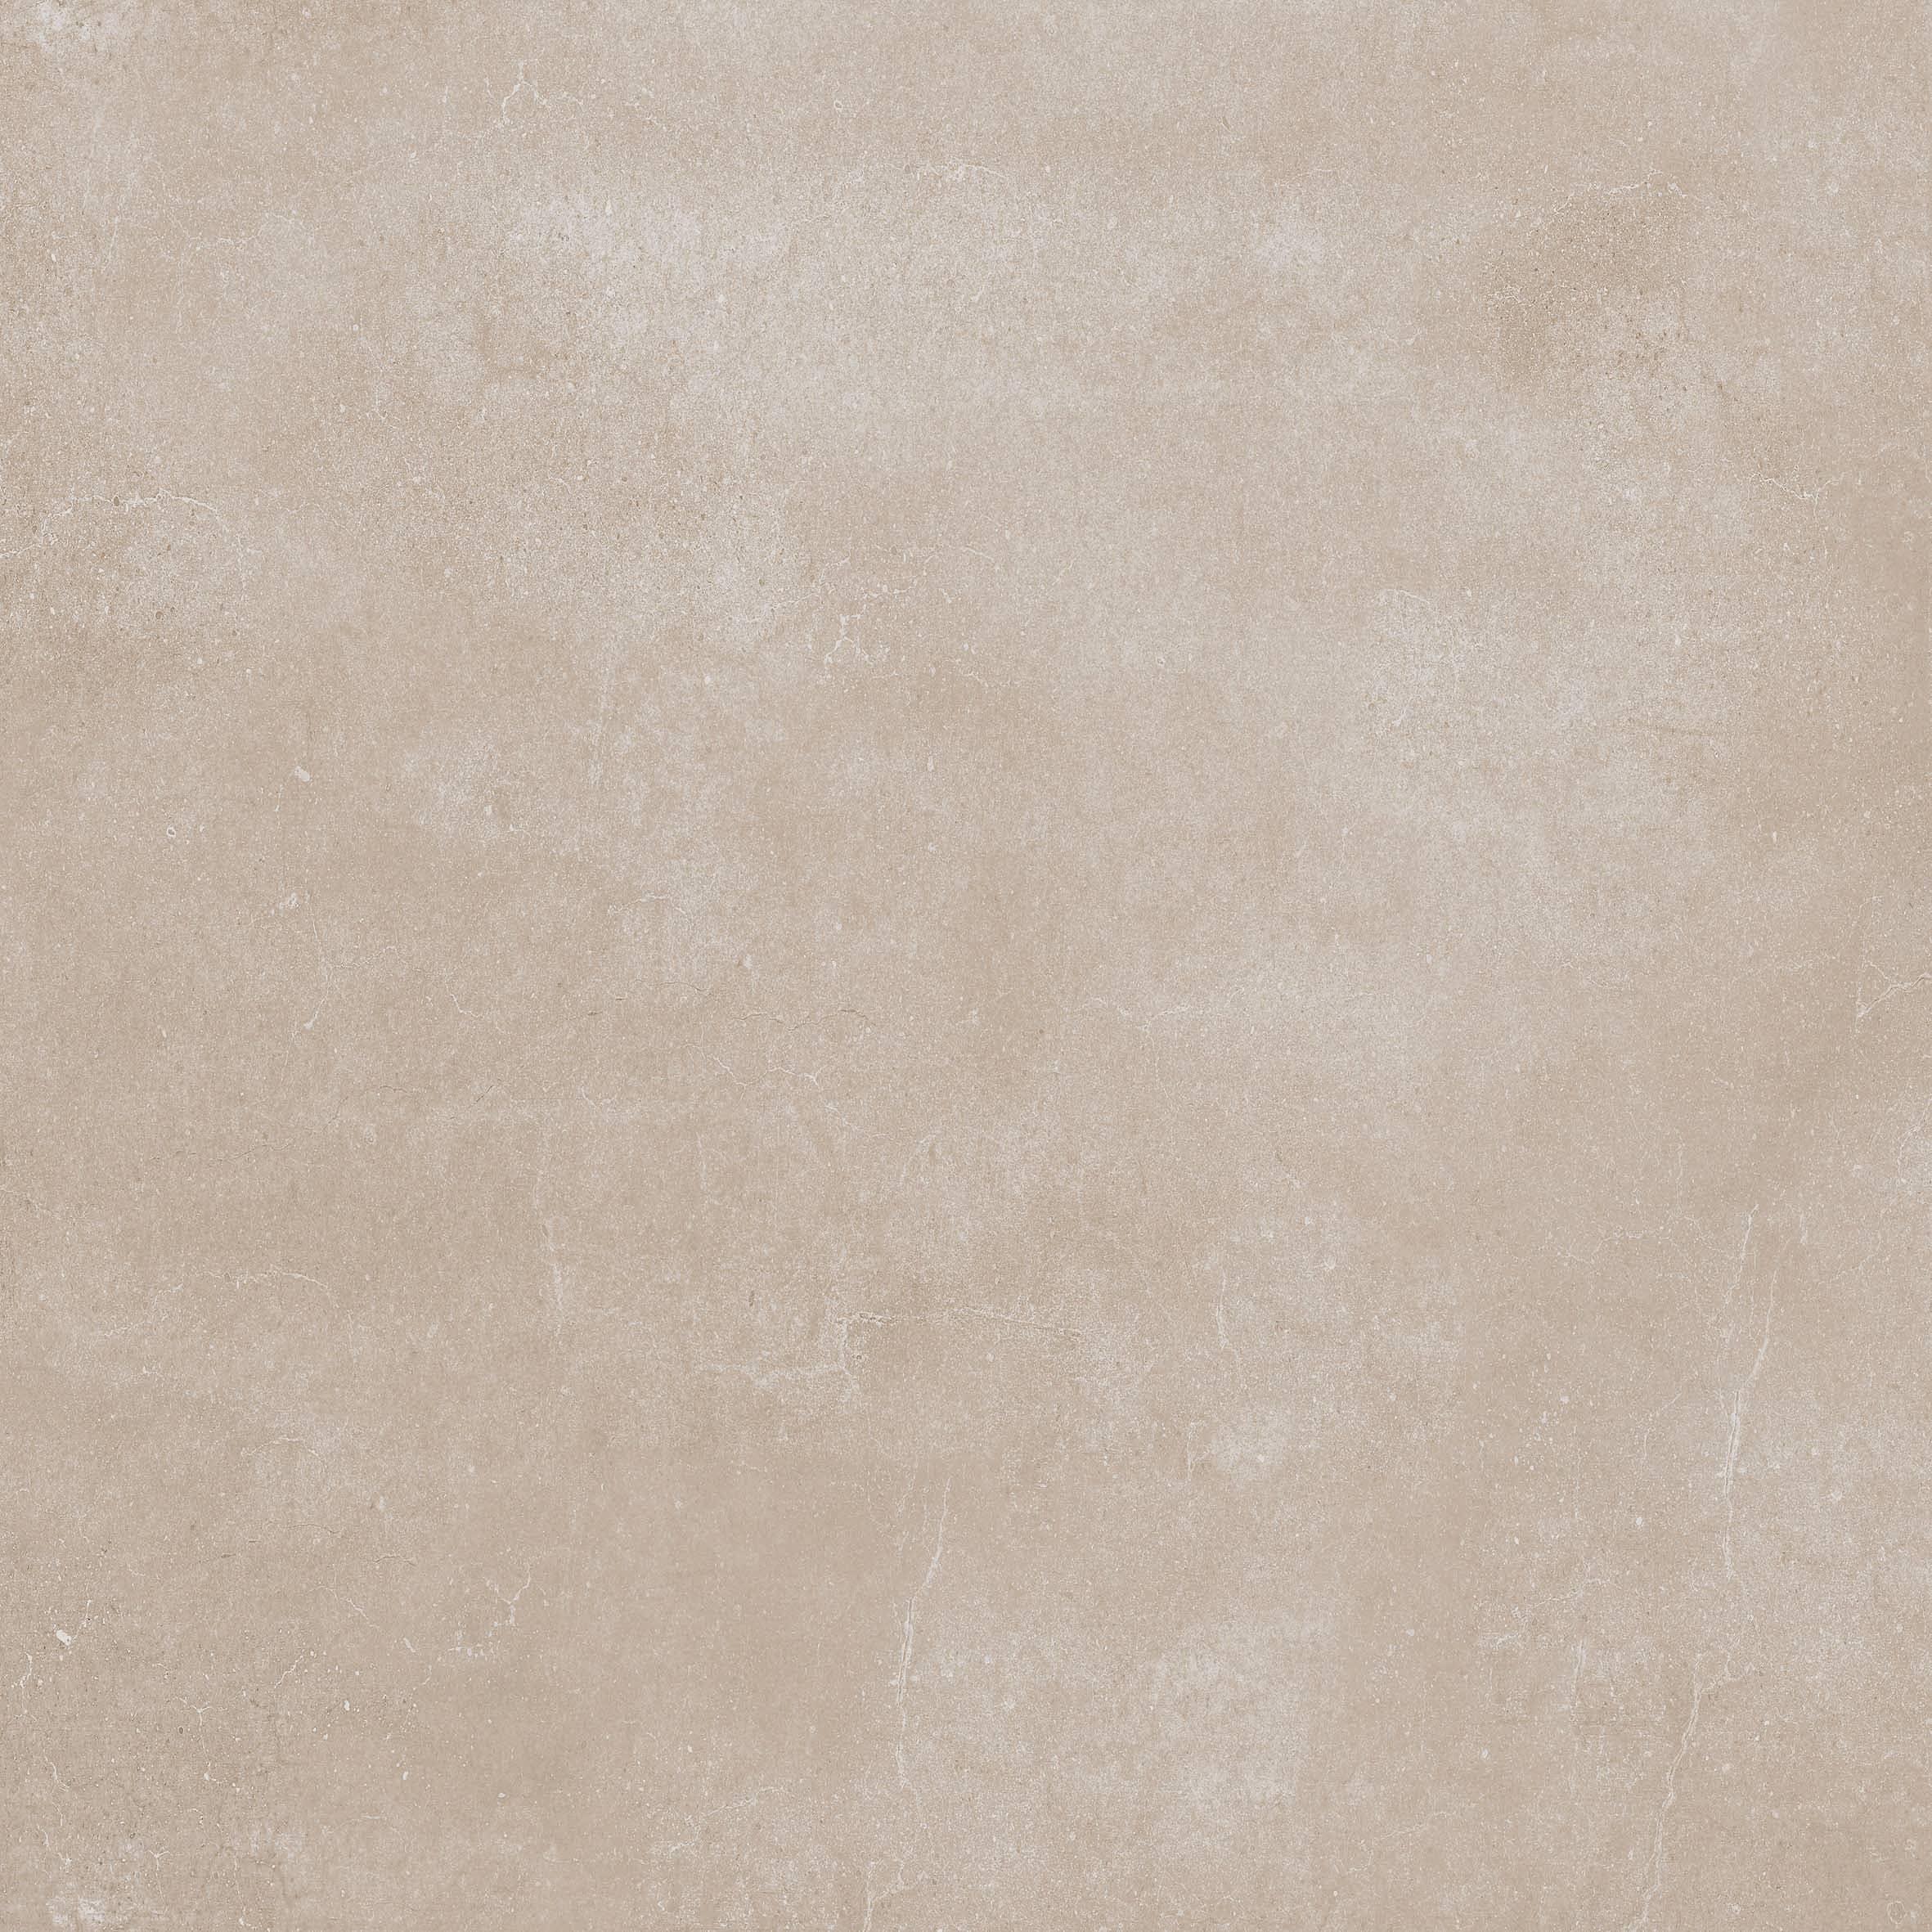 Aanbieding Terrastegels 60x60.Mix Match Plaster Vloertegel 60x60 Cm Zand